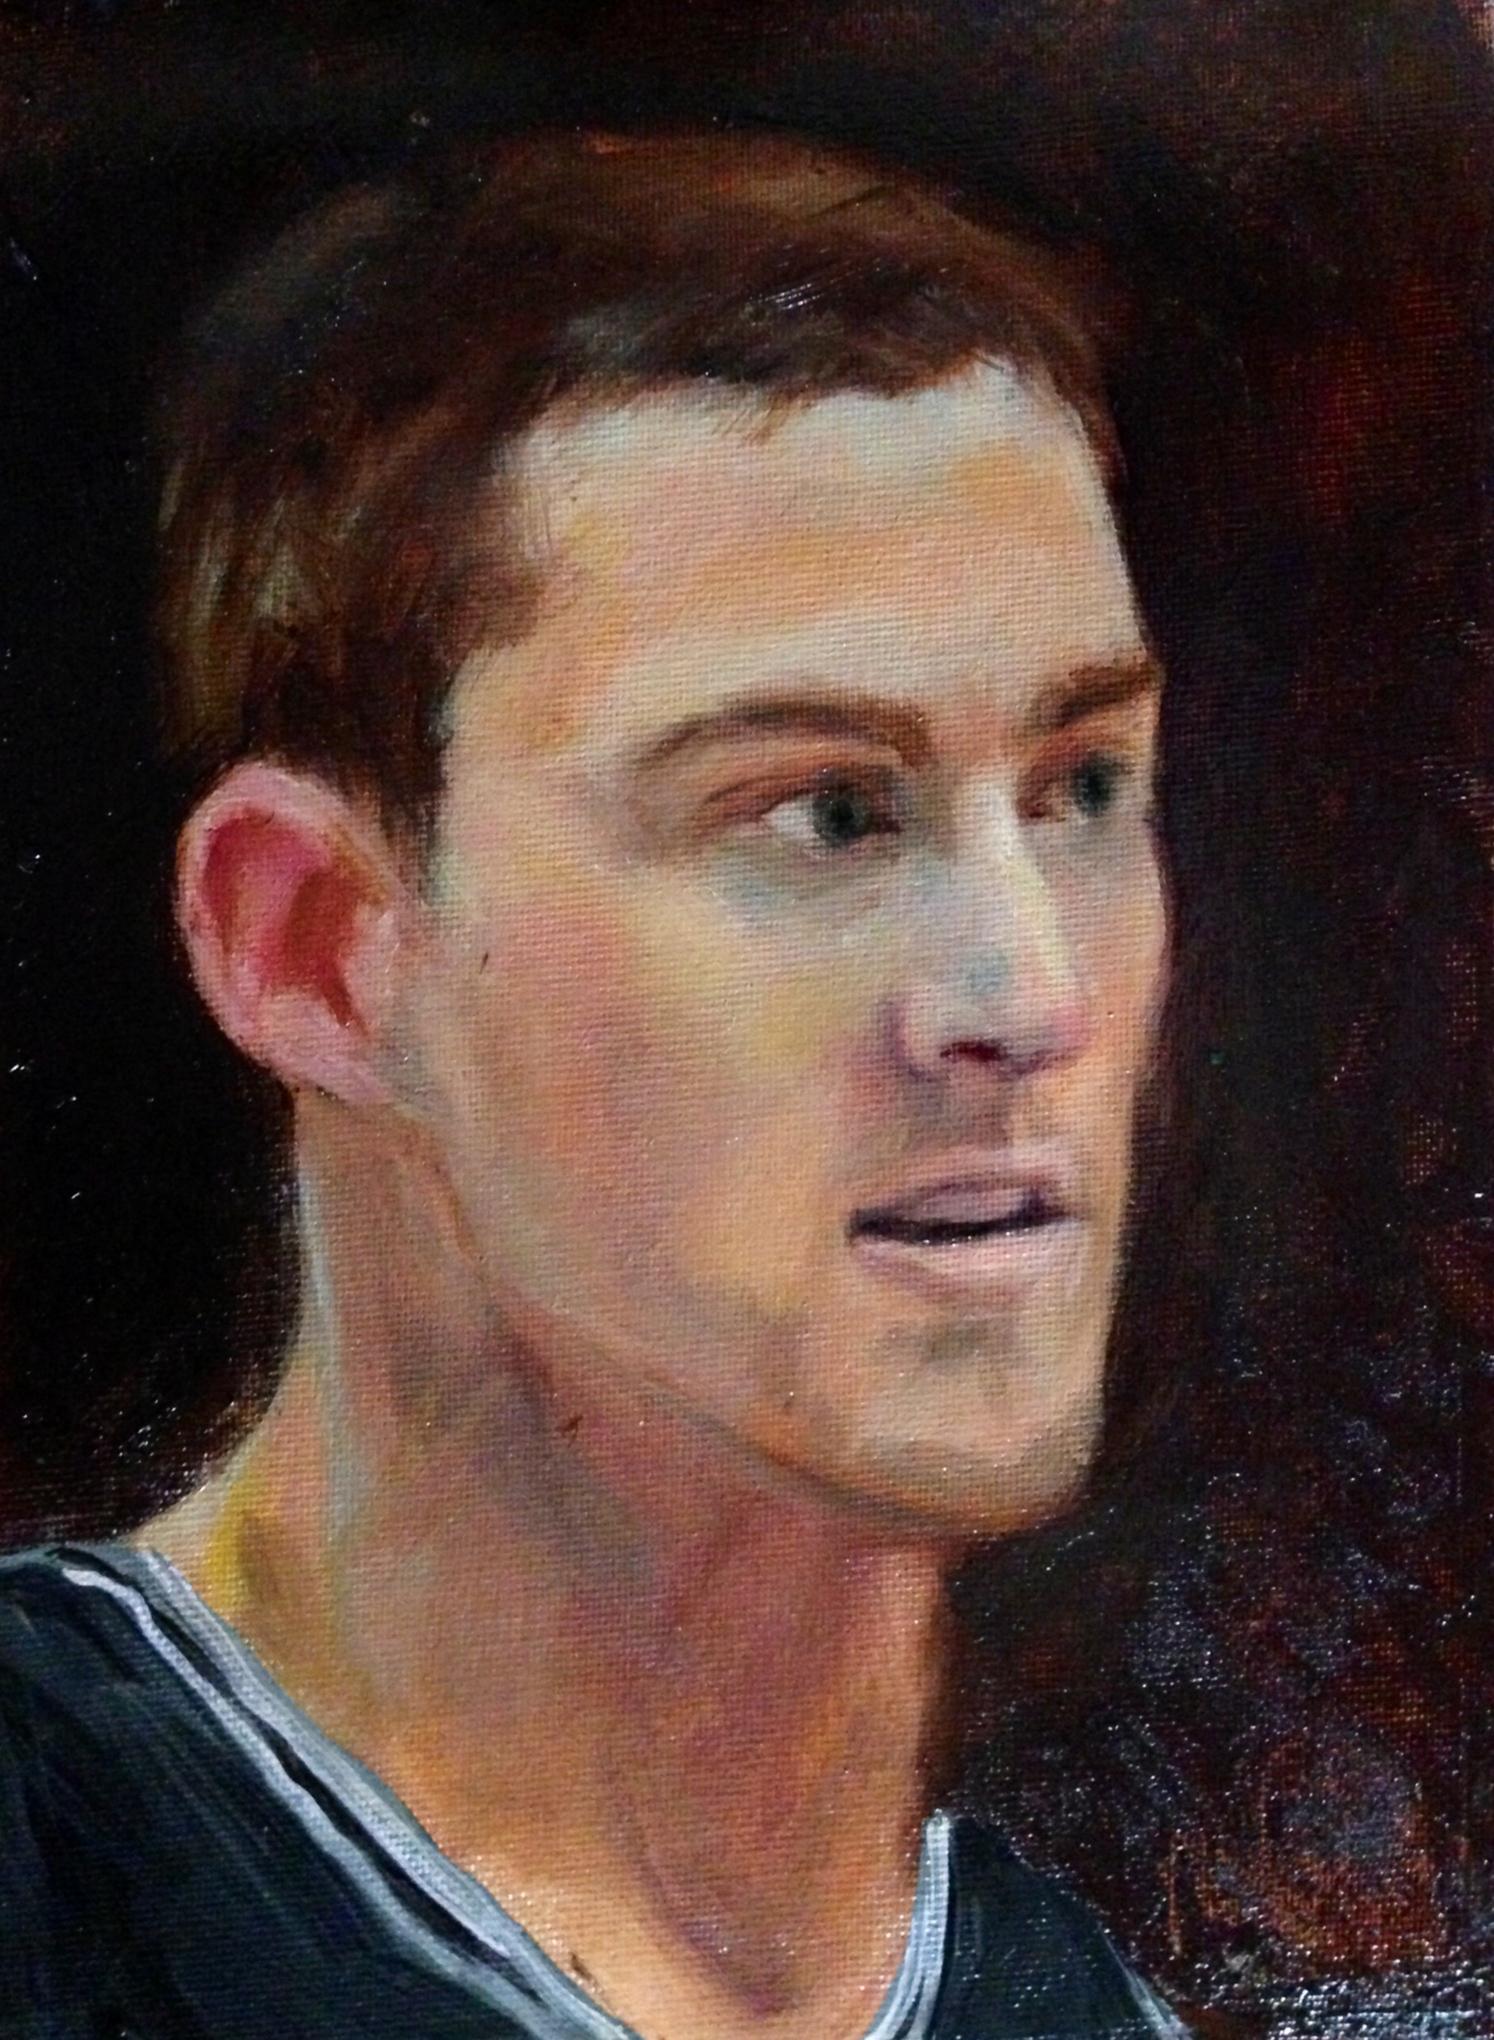 Aron-baynes-portrait